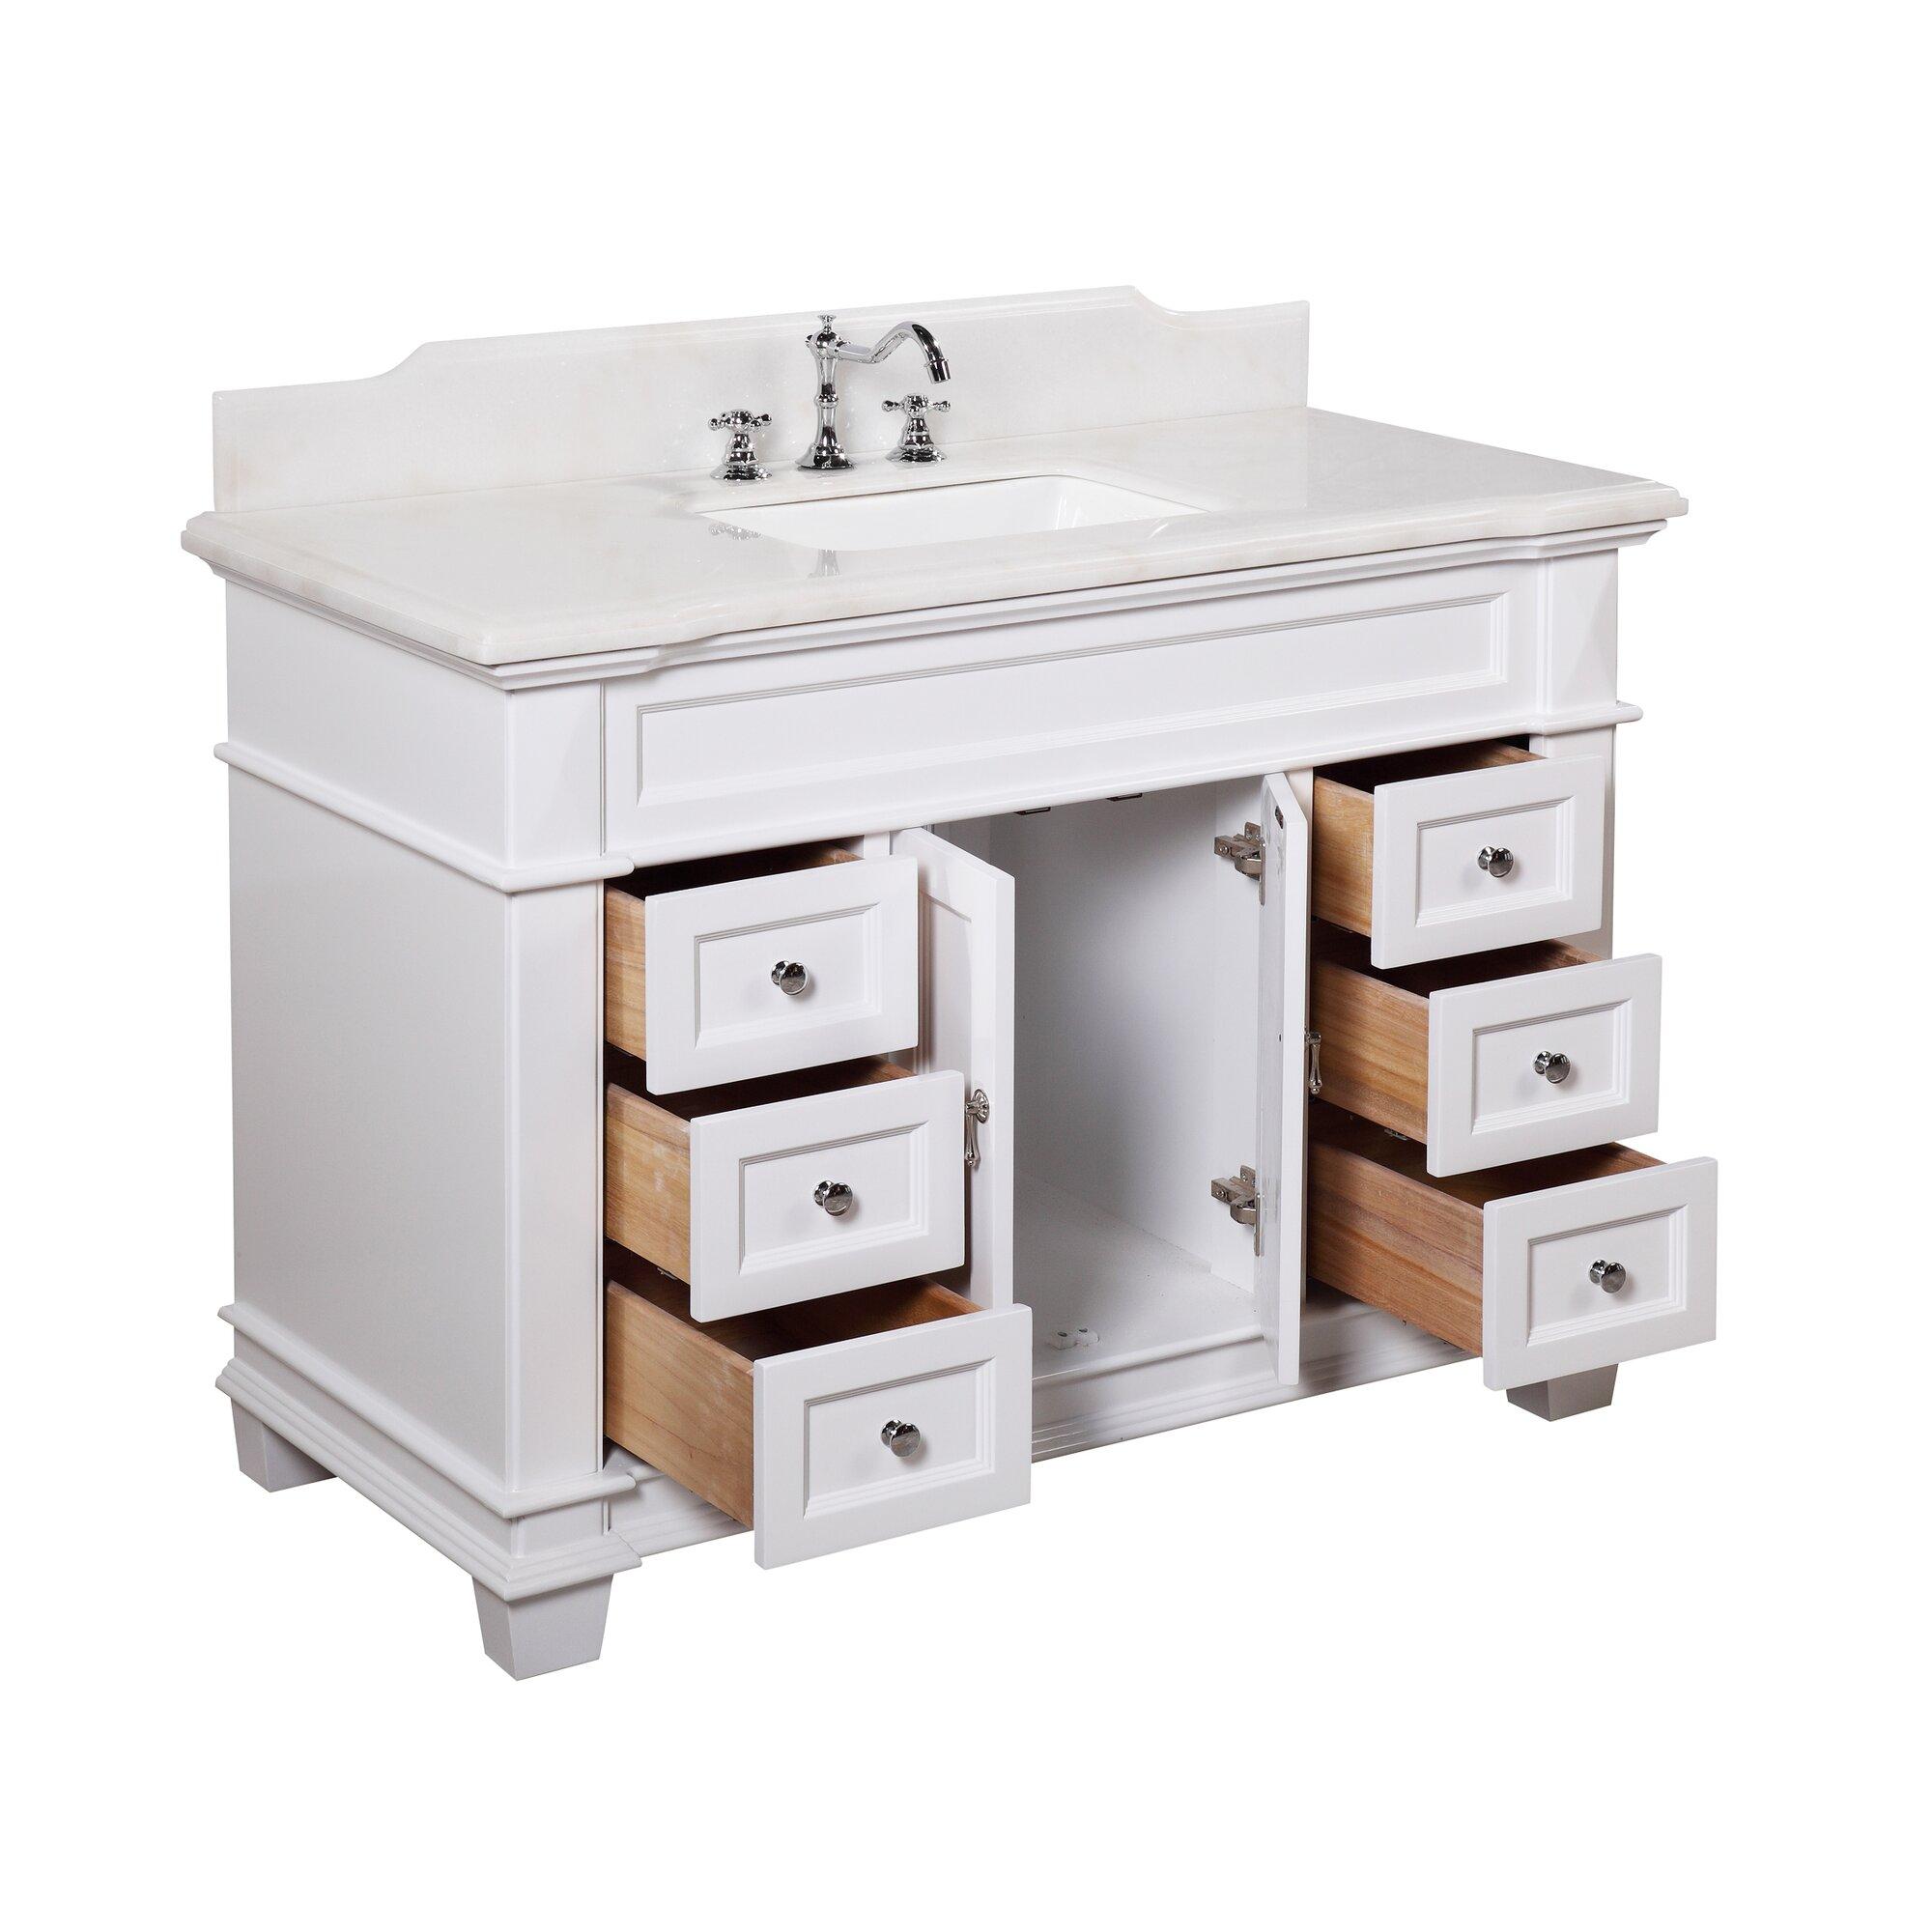 kbc elizabeth 48 single bathroom vanity set reviews wayfair. Black Bedroom Furniture Sets. Home Design Ideas